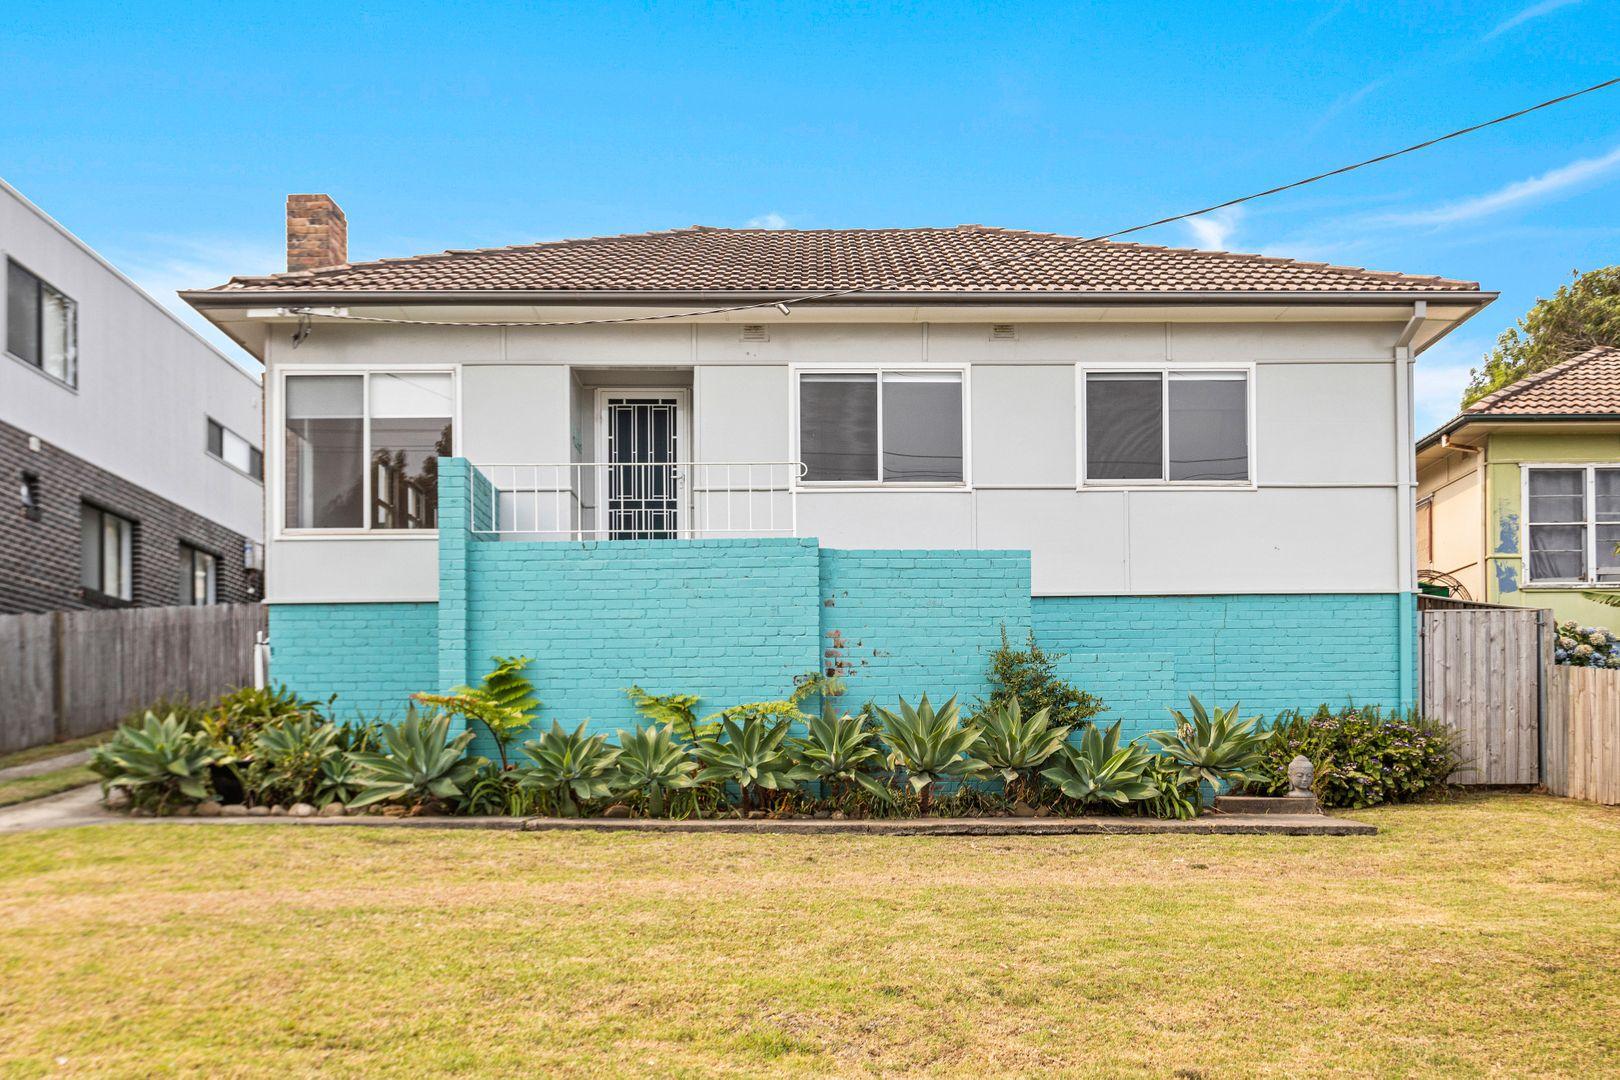 70 Point Street, Bulli NSW 2516, Image 0